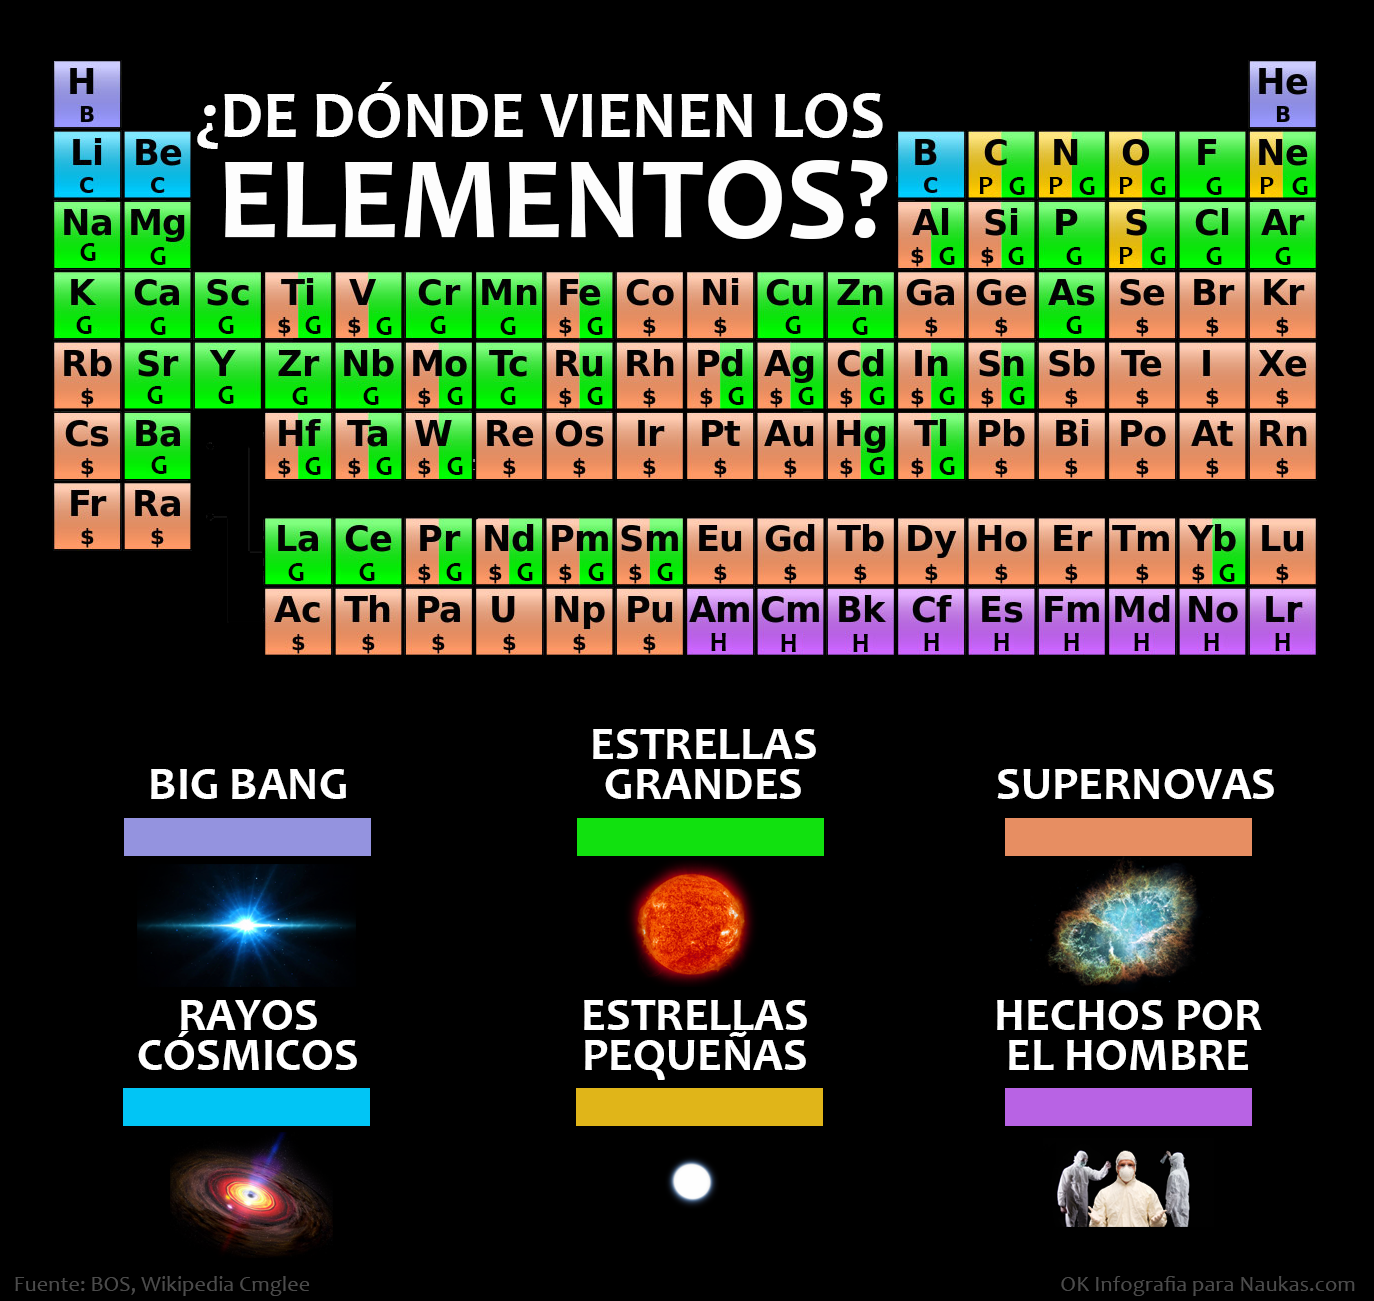 Infografa de dnde vienen los elementos astronoma naukas click para ampliar infografa de carolina jimnez urtaz Gallery